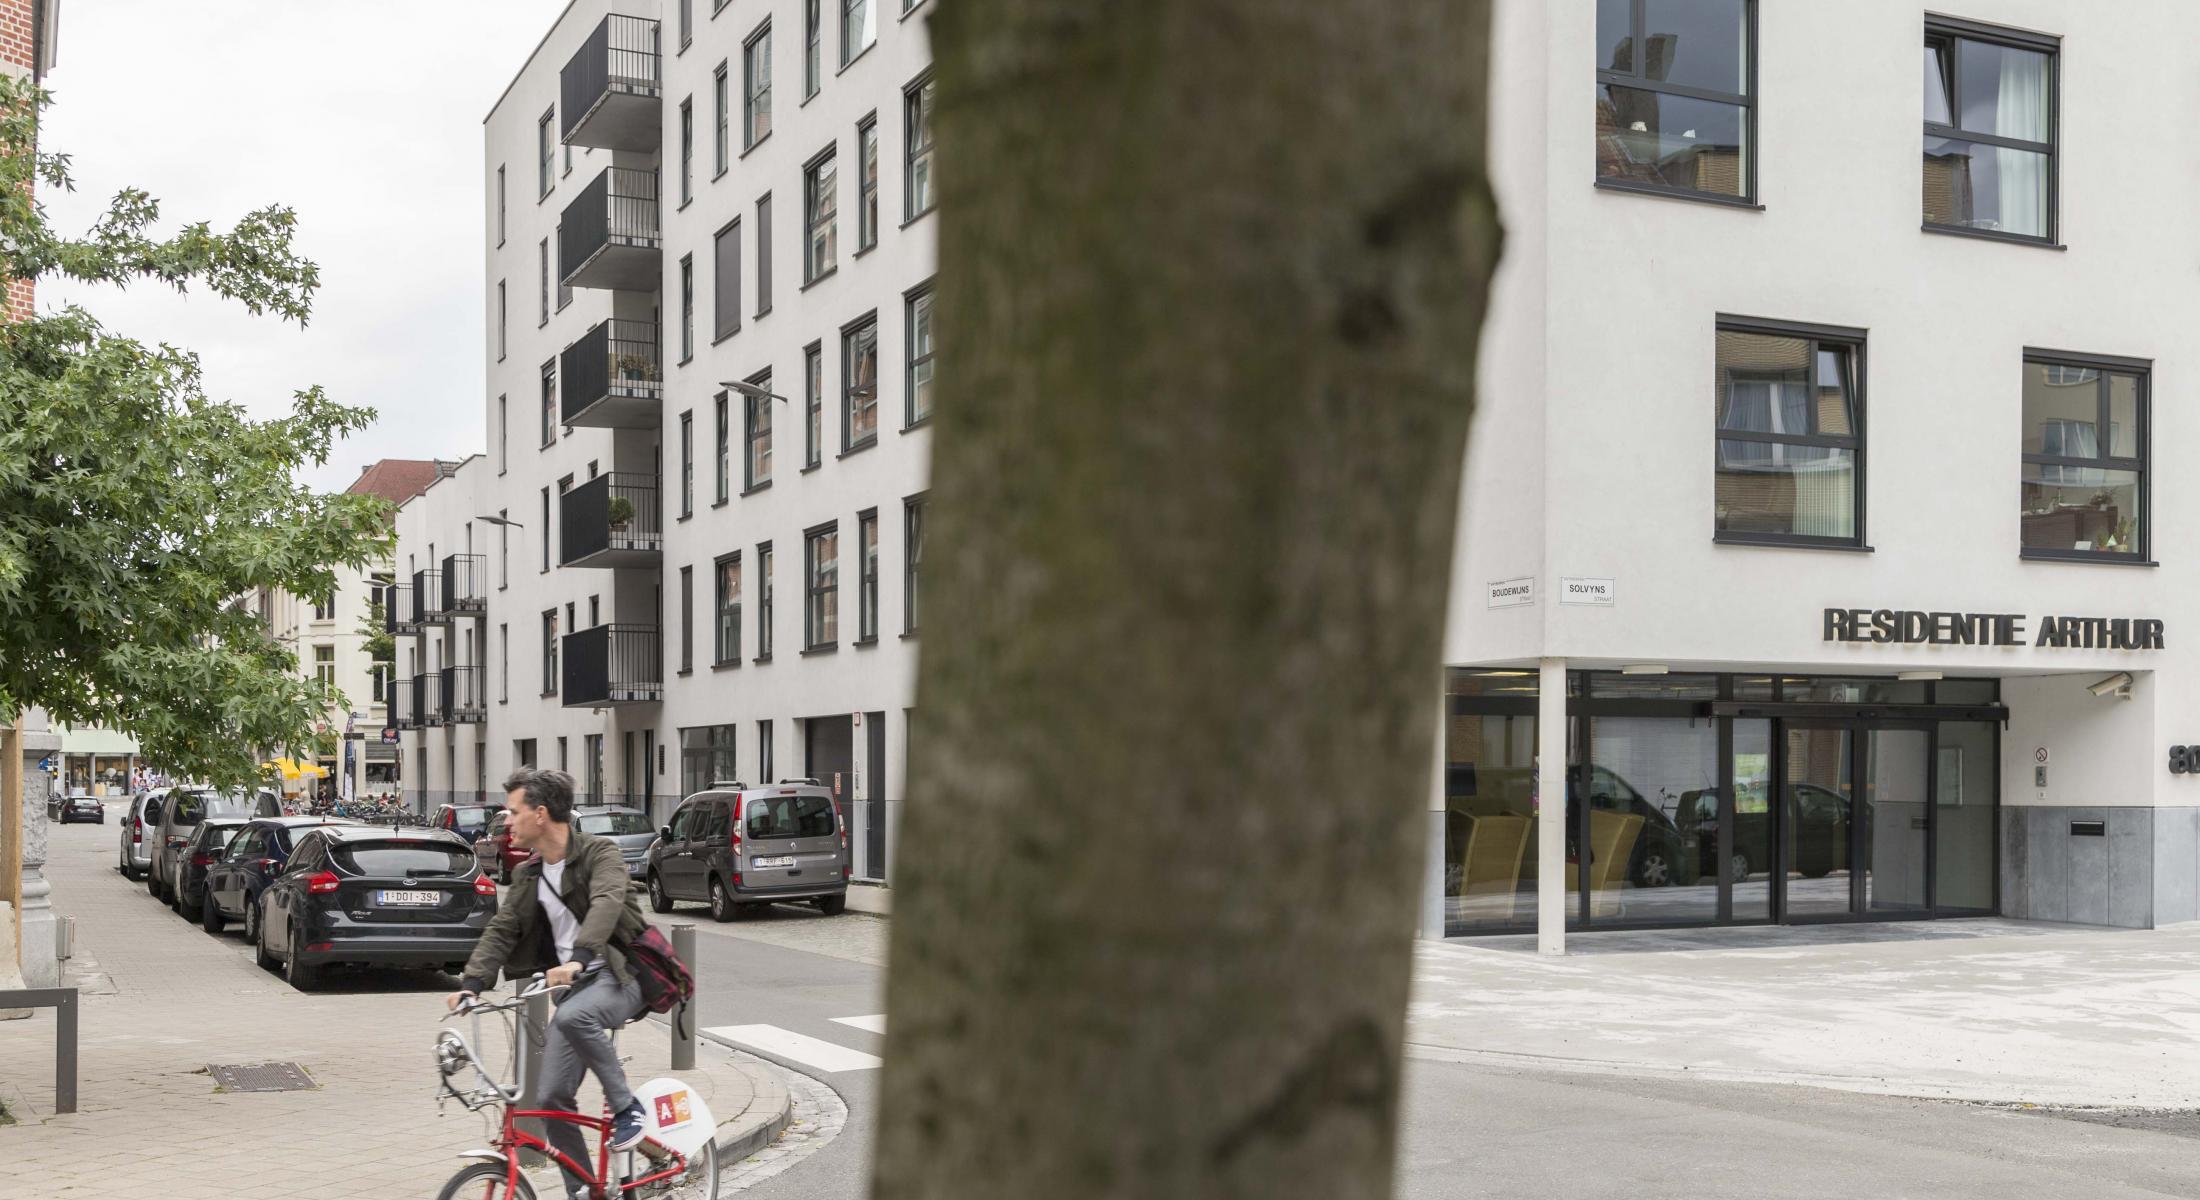 Creating Hospitality - WZC arthur Antwerpen 1 - moments furniture